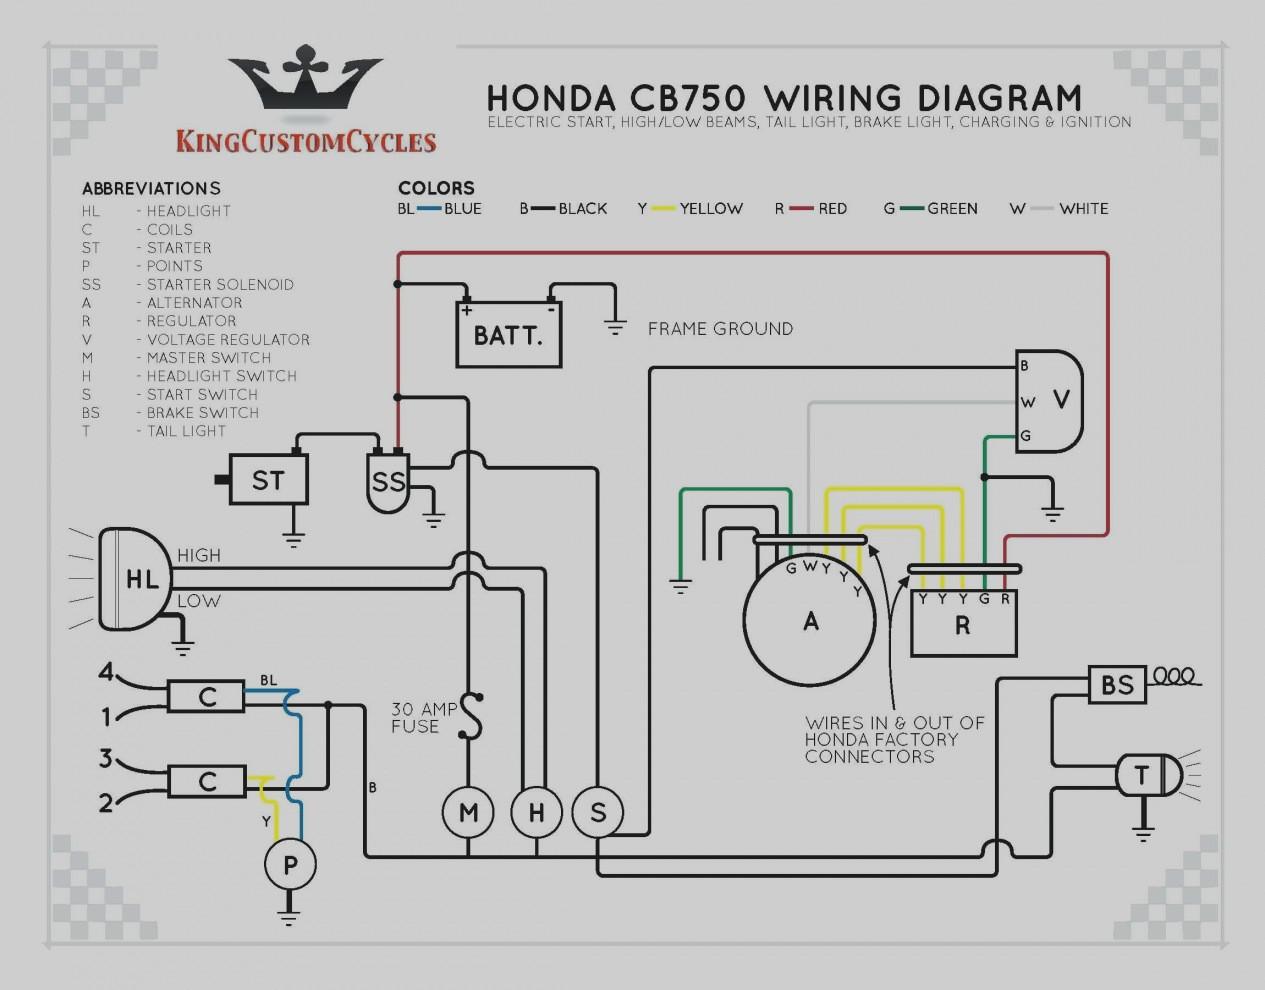 hight resolution of harley dyna voltage regulator wiring diagram 12v voltage regulator club car